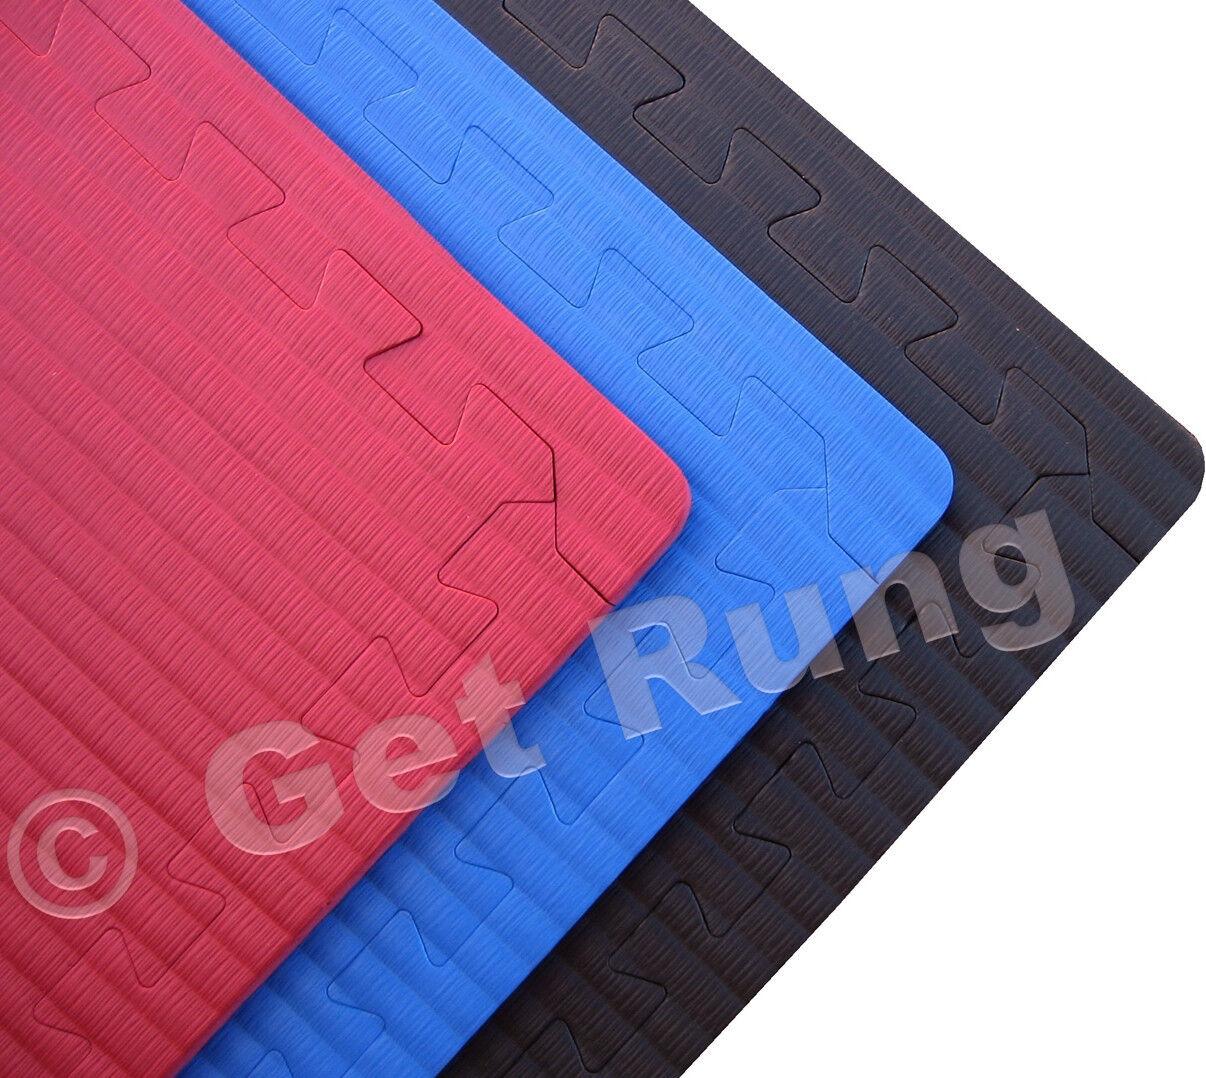 blueee tatami wrestling martial arts puzzle mats flooring mma  foam puzzle tiles  offering store